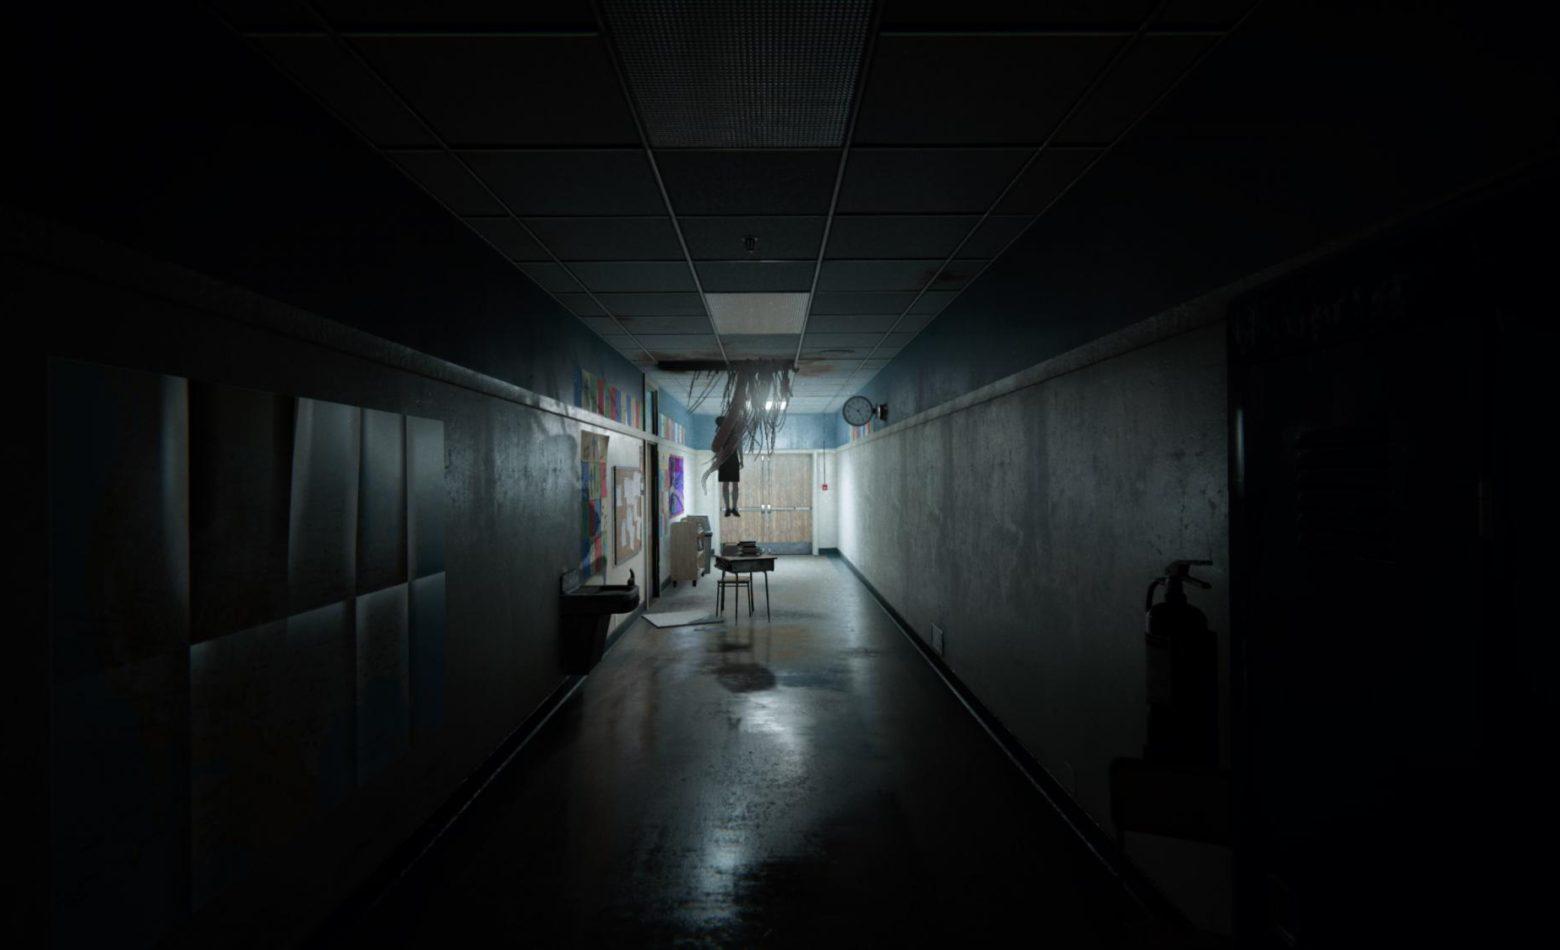 Gameplay: chega de correr, vamos terminar Outlast 2!